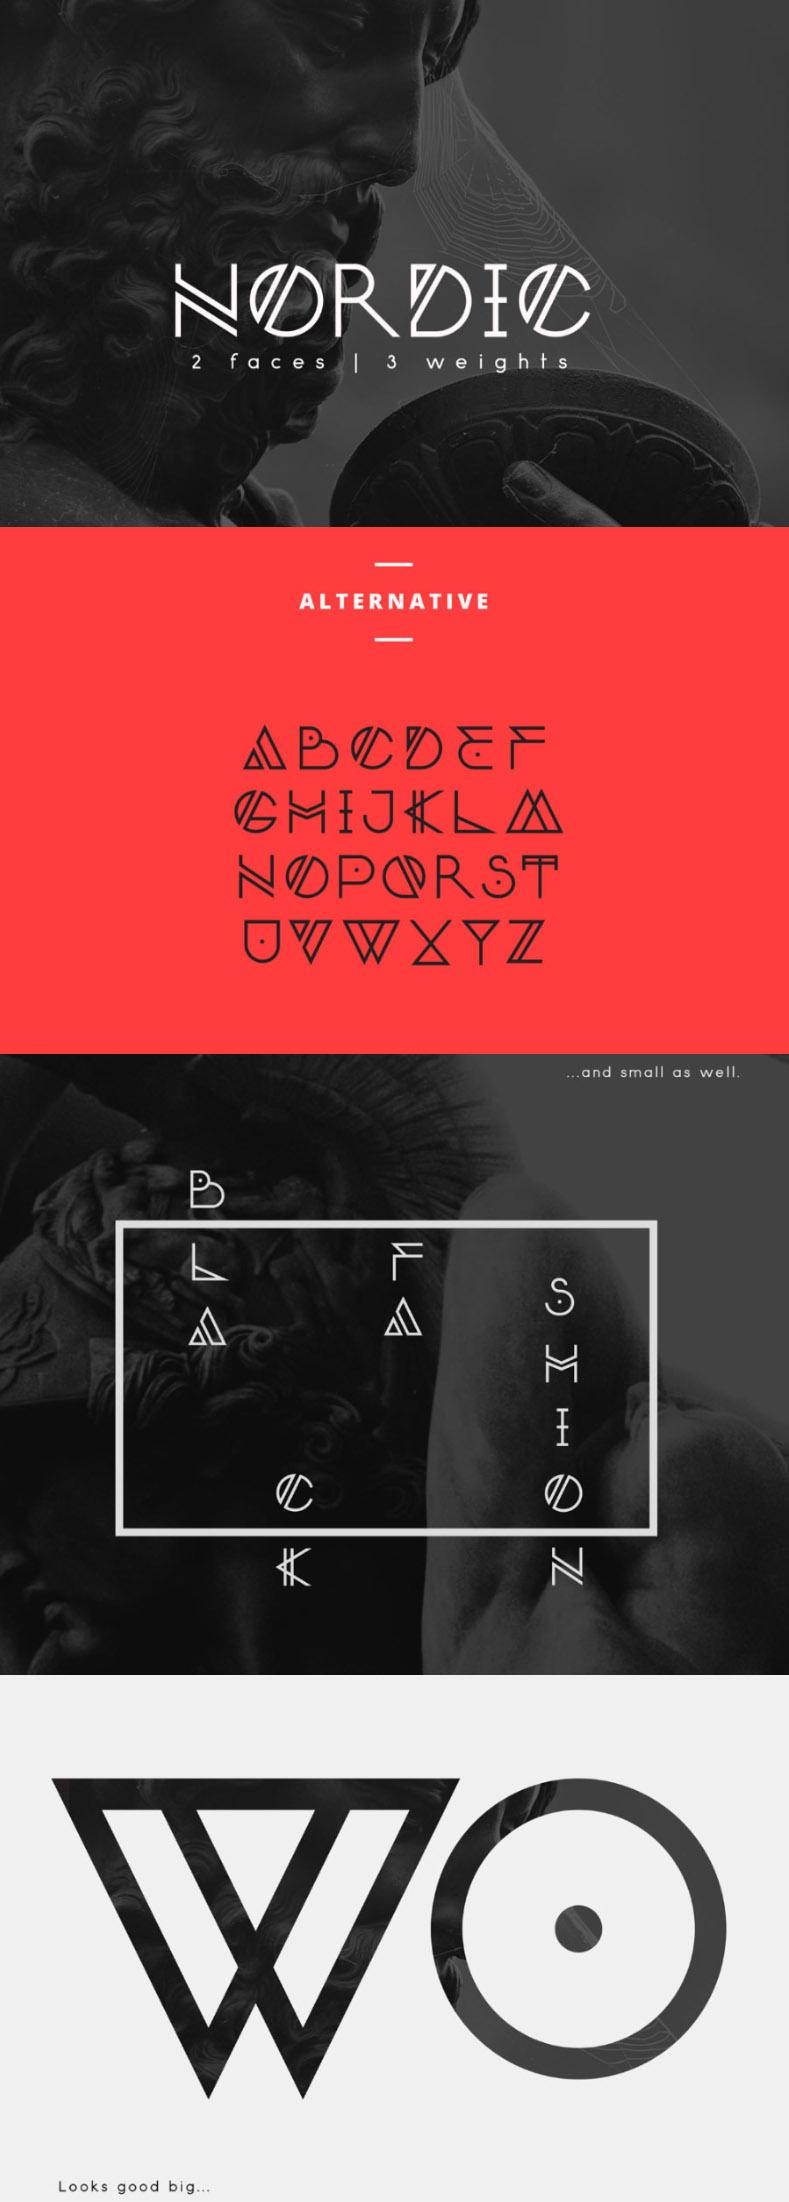 Nordic Free Font - Free Design Resources